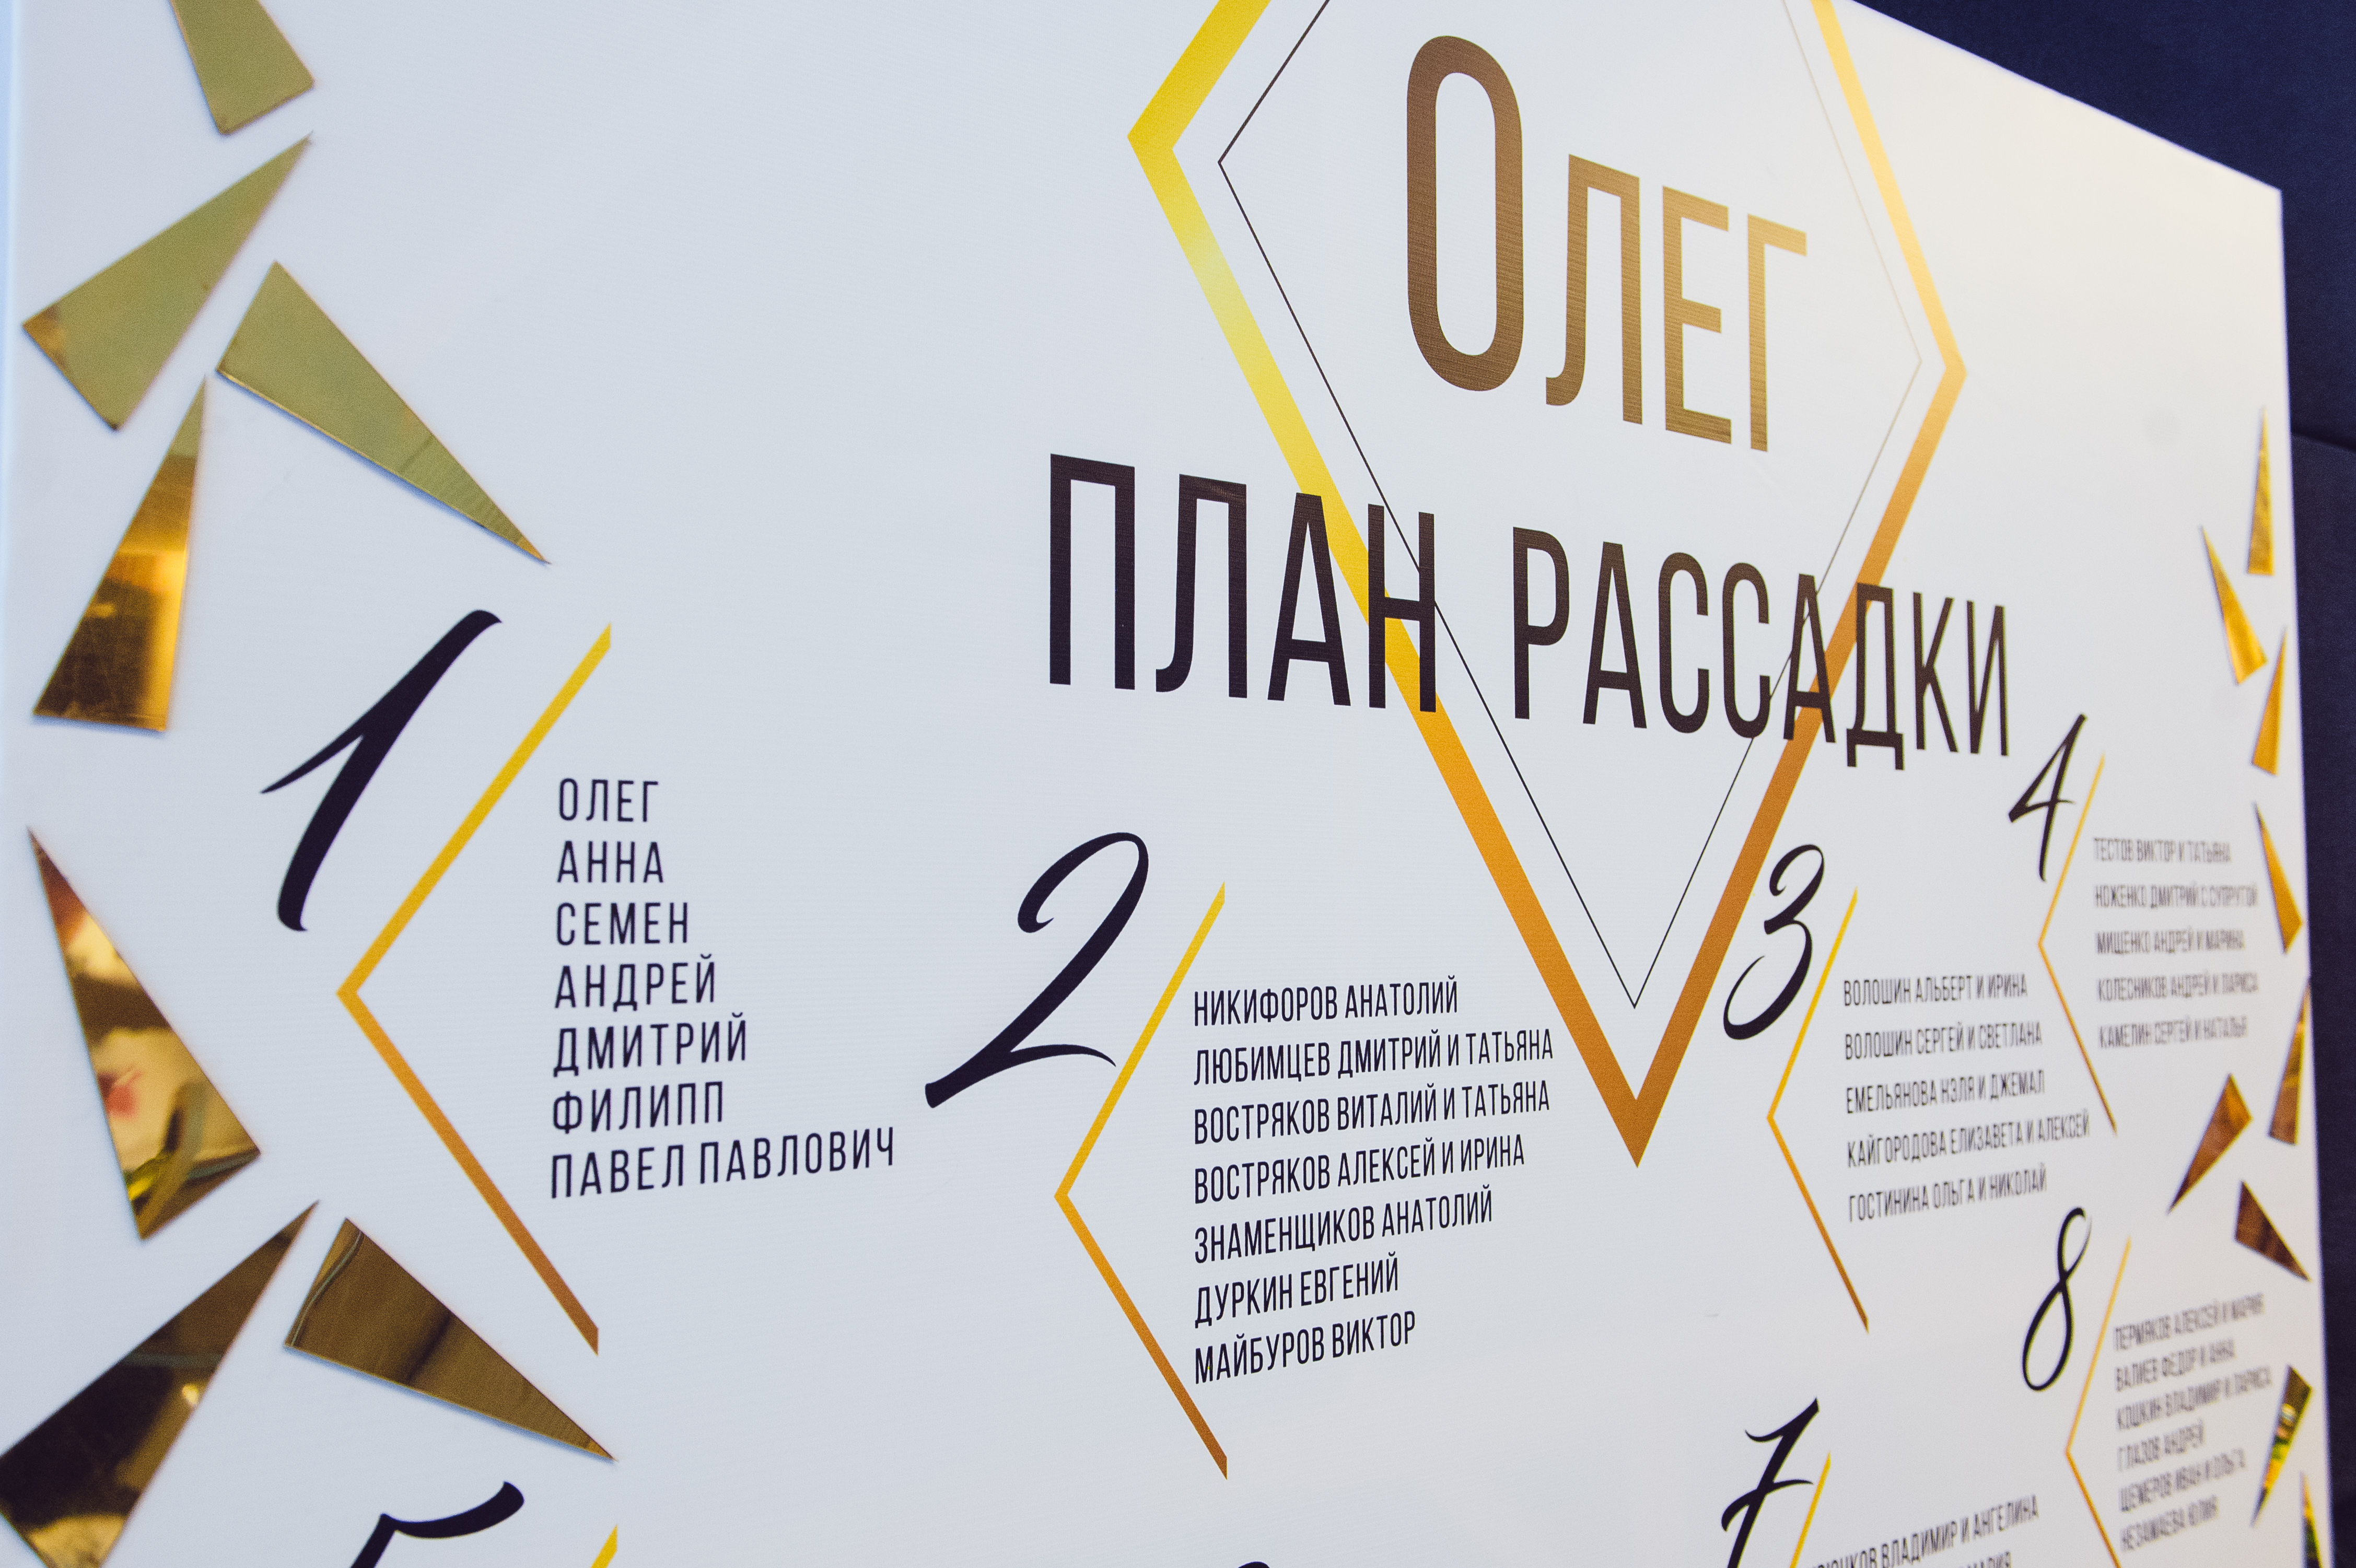 2017-07-31_16-02-17_Postolnik